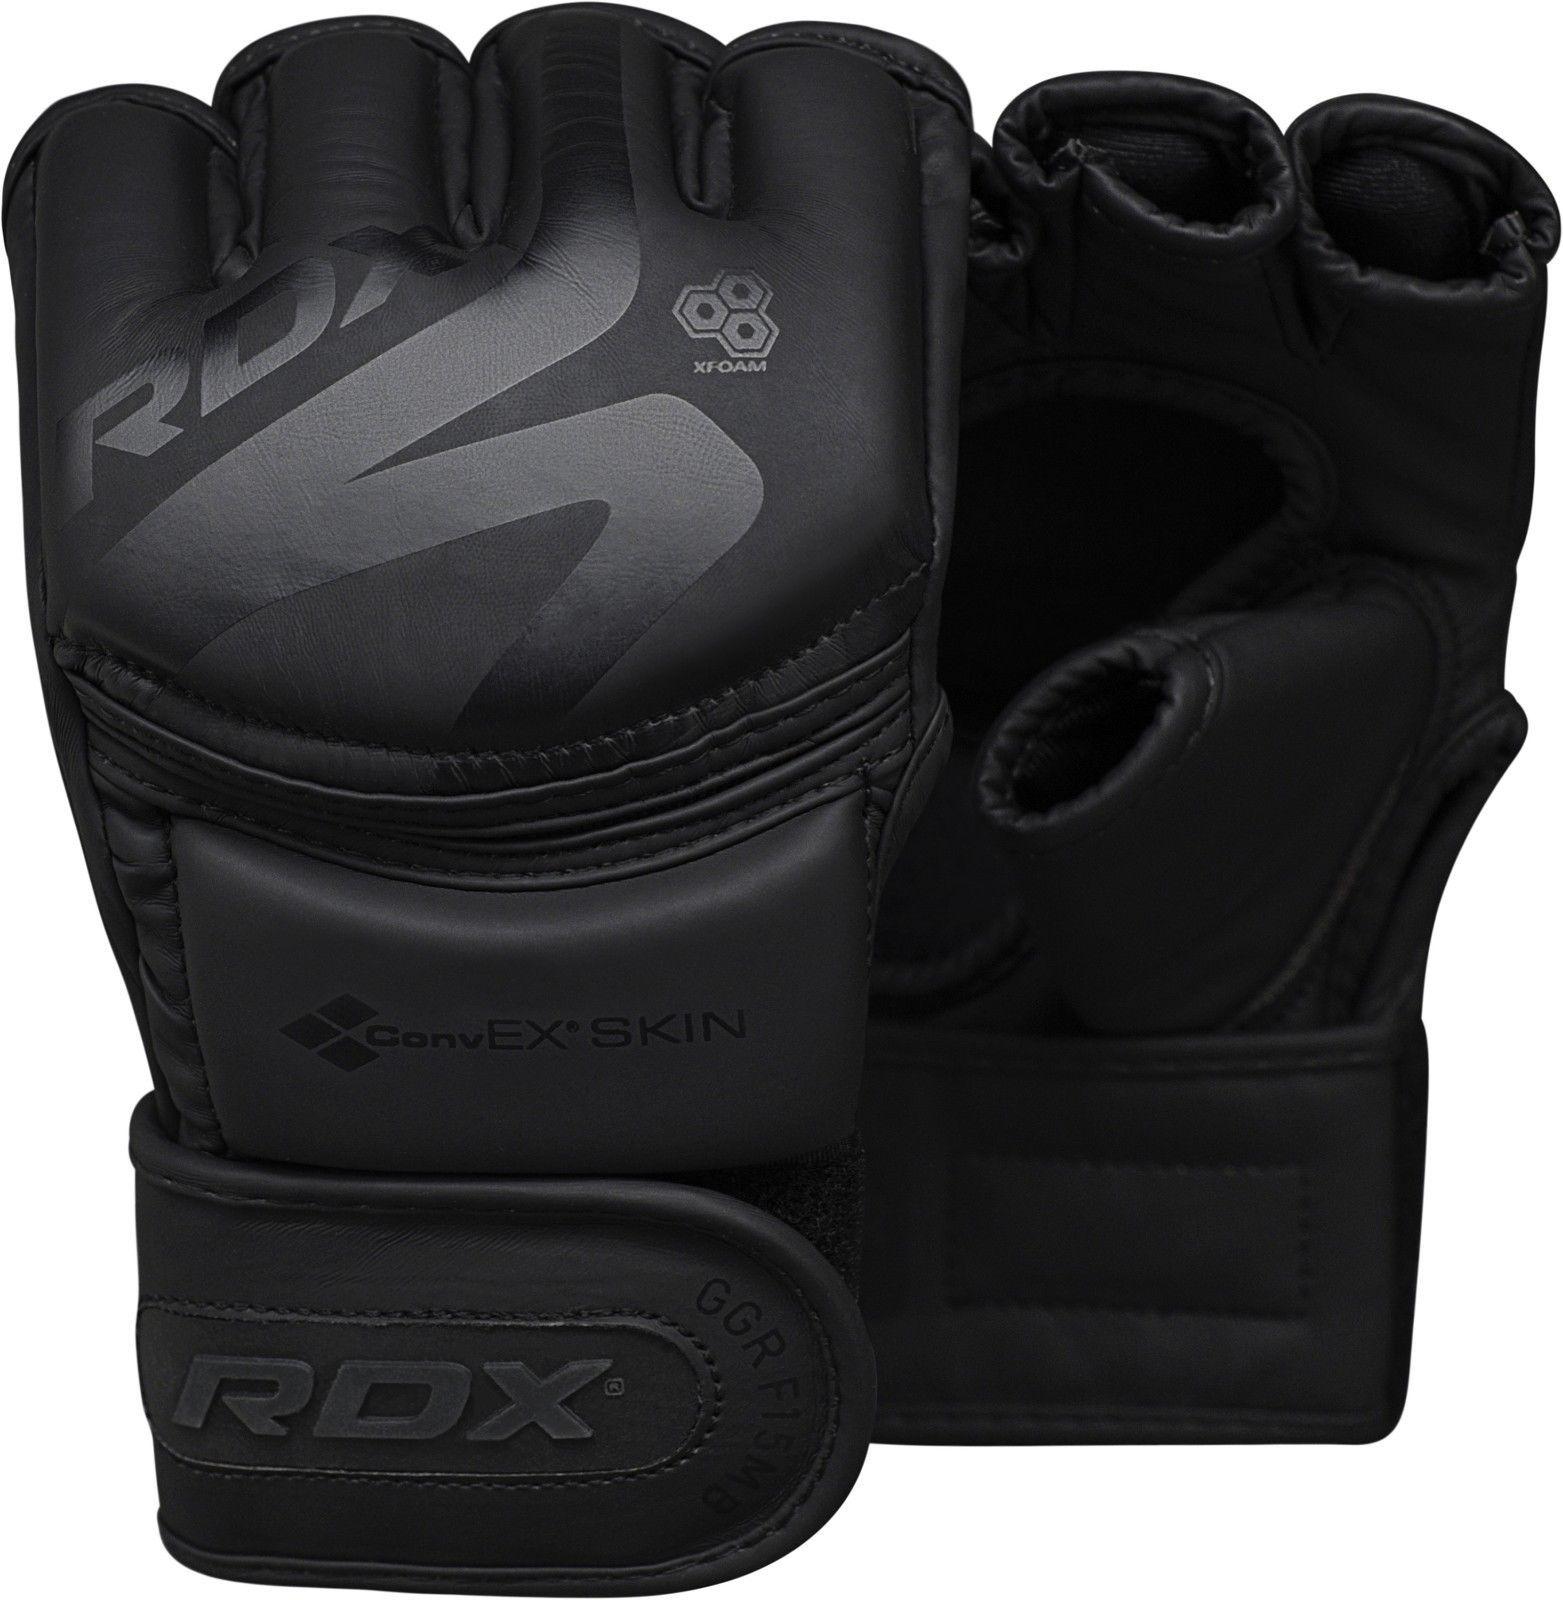 RDX Boxe Bandage Bandes MMA Sous Gants Prot/ège Poignet Bande Muay Thai